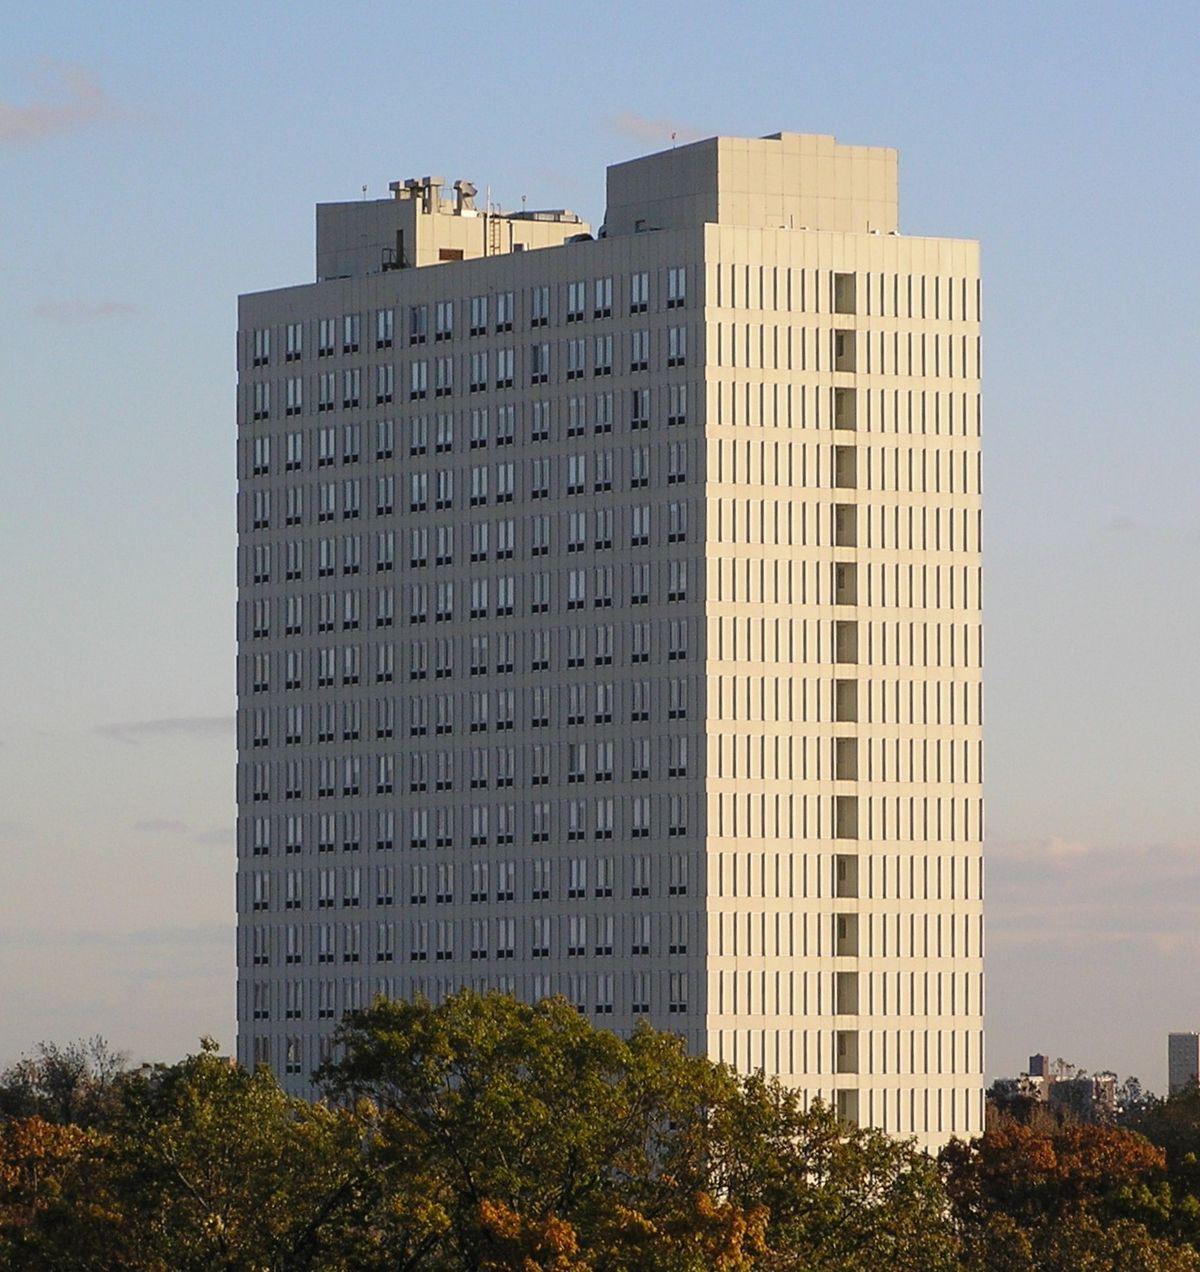 Russian Mission School in New York - Wikipedia